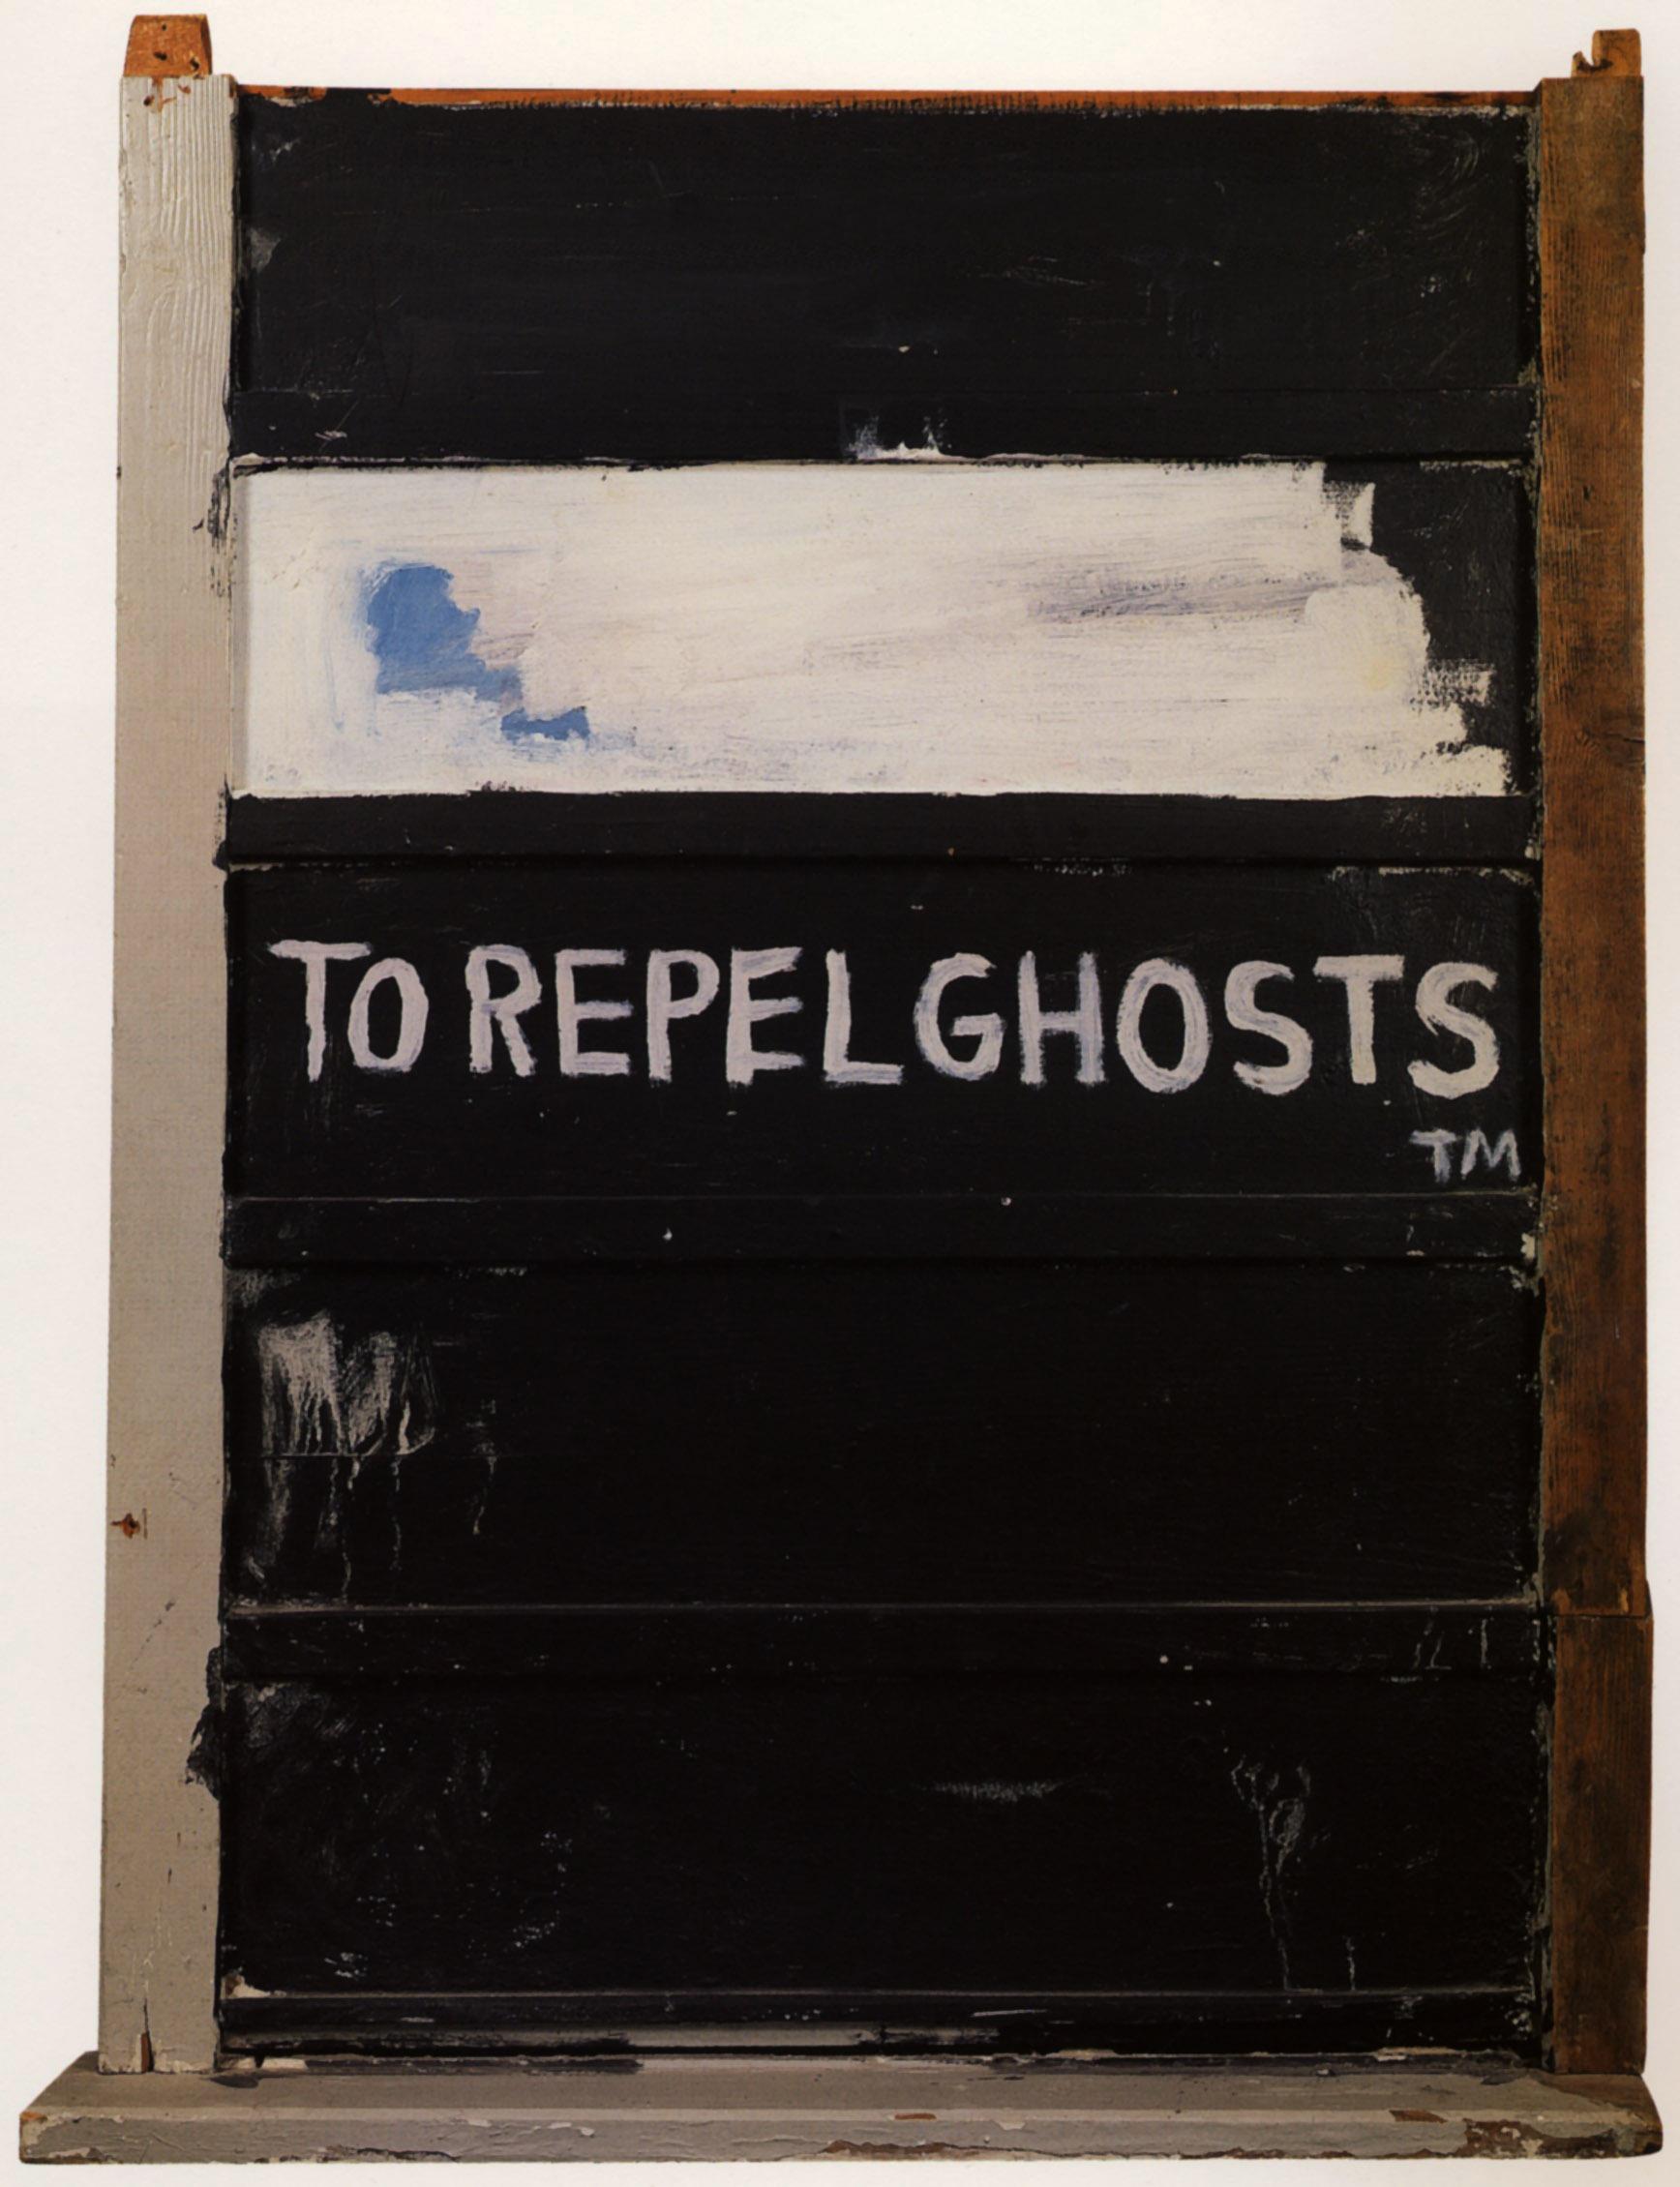 Jean-Michel Basquiat To Repel Ghosts. 1986